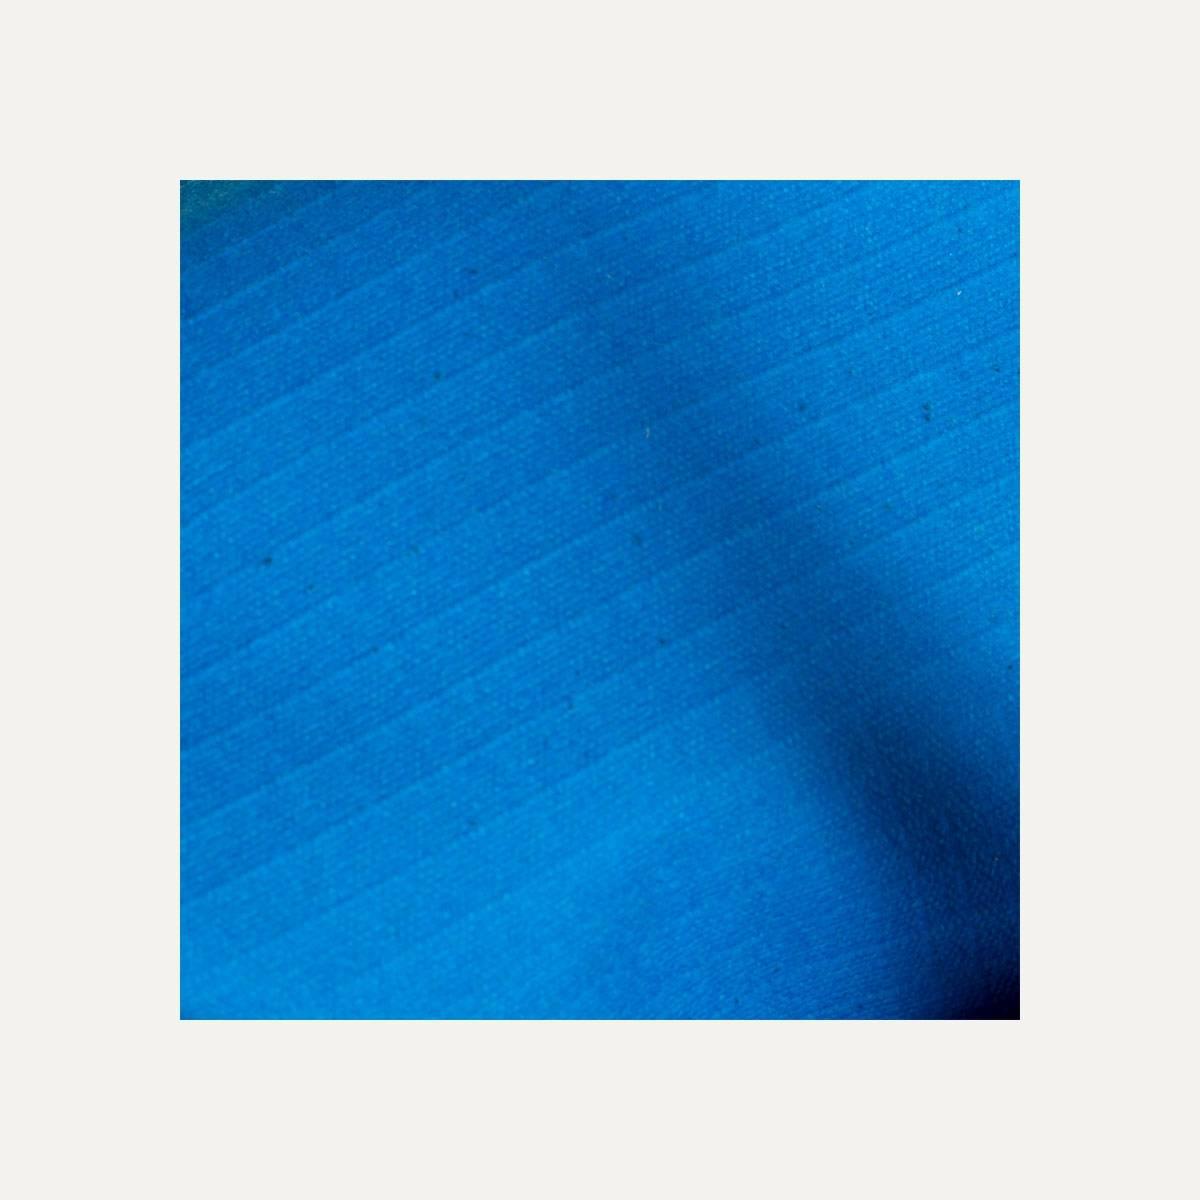 Jamy Backpack - Regentex Blue (image n°8)